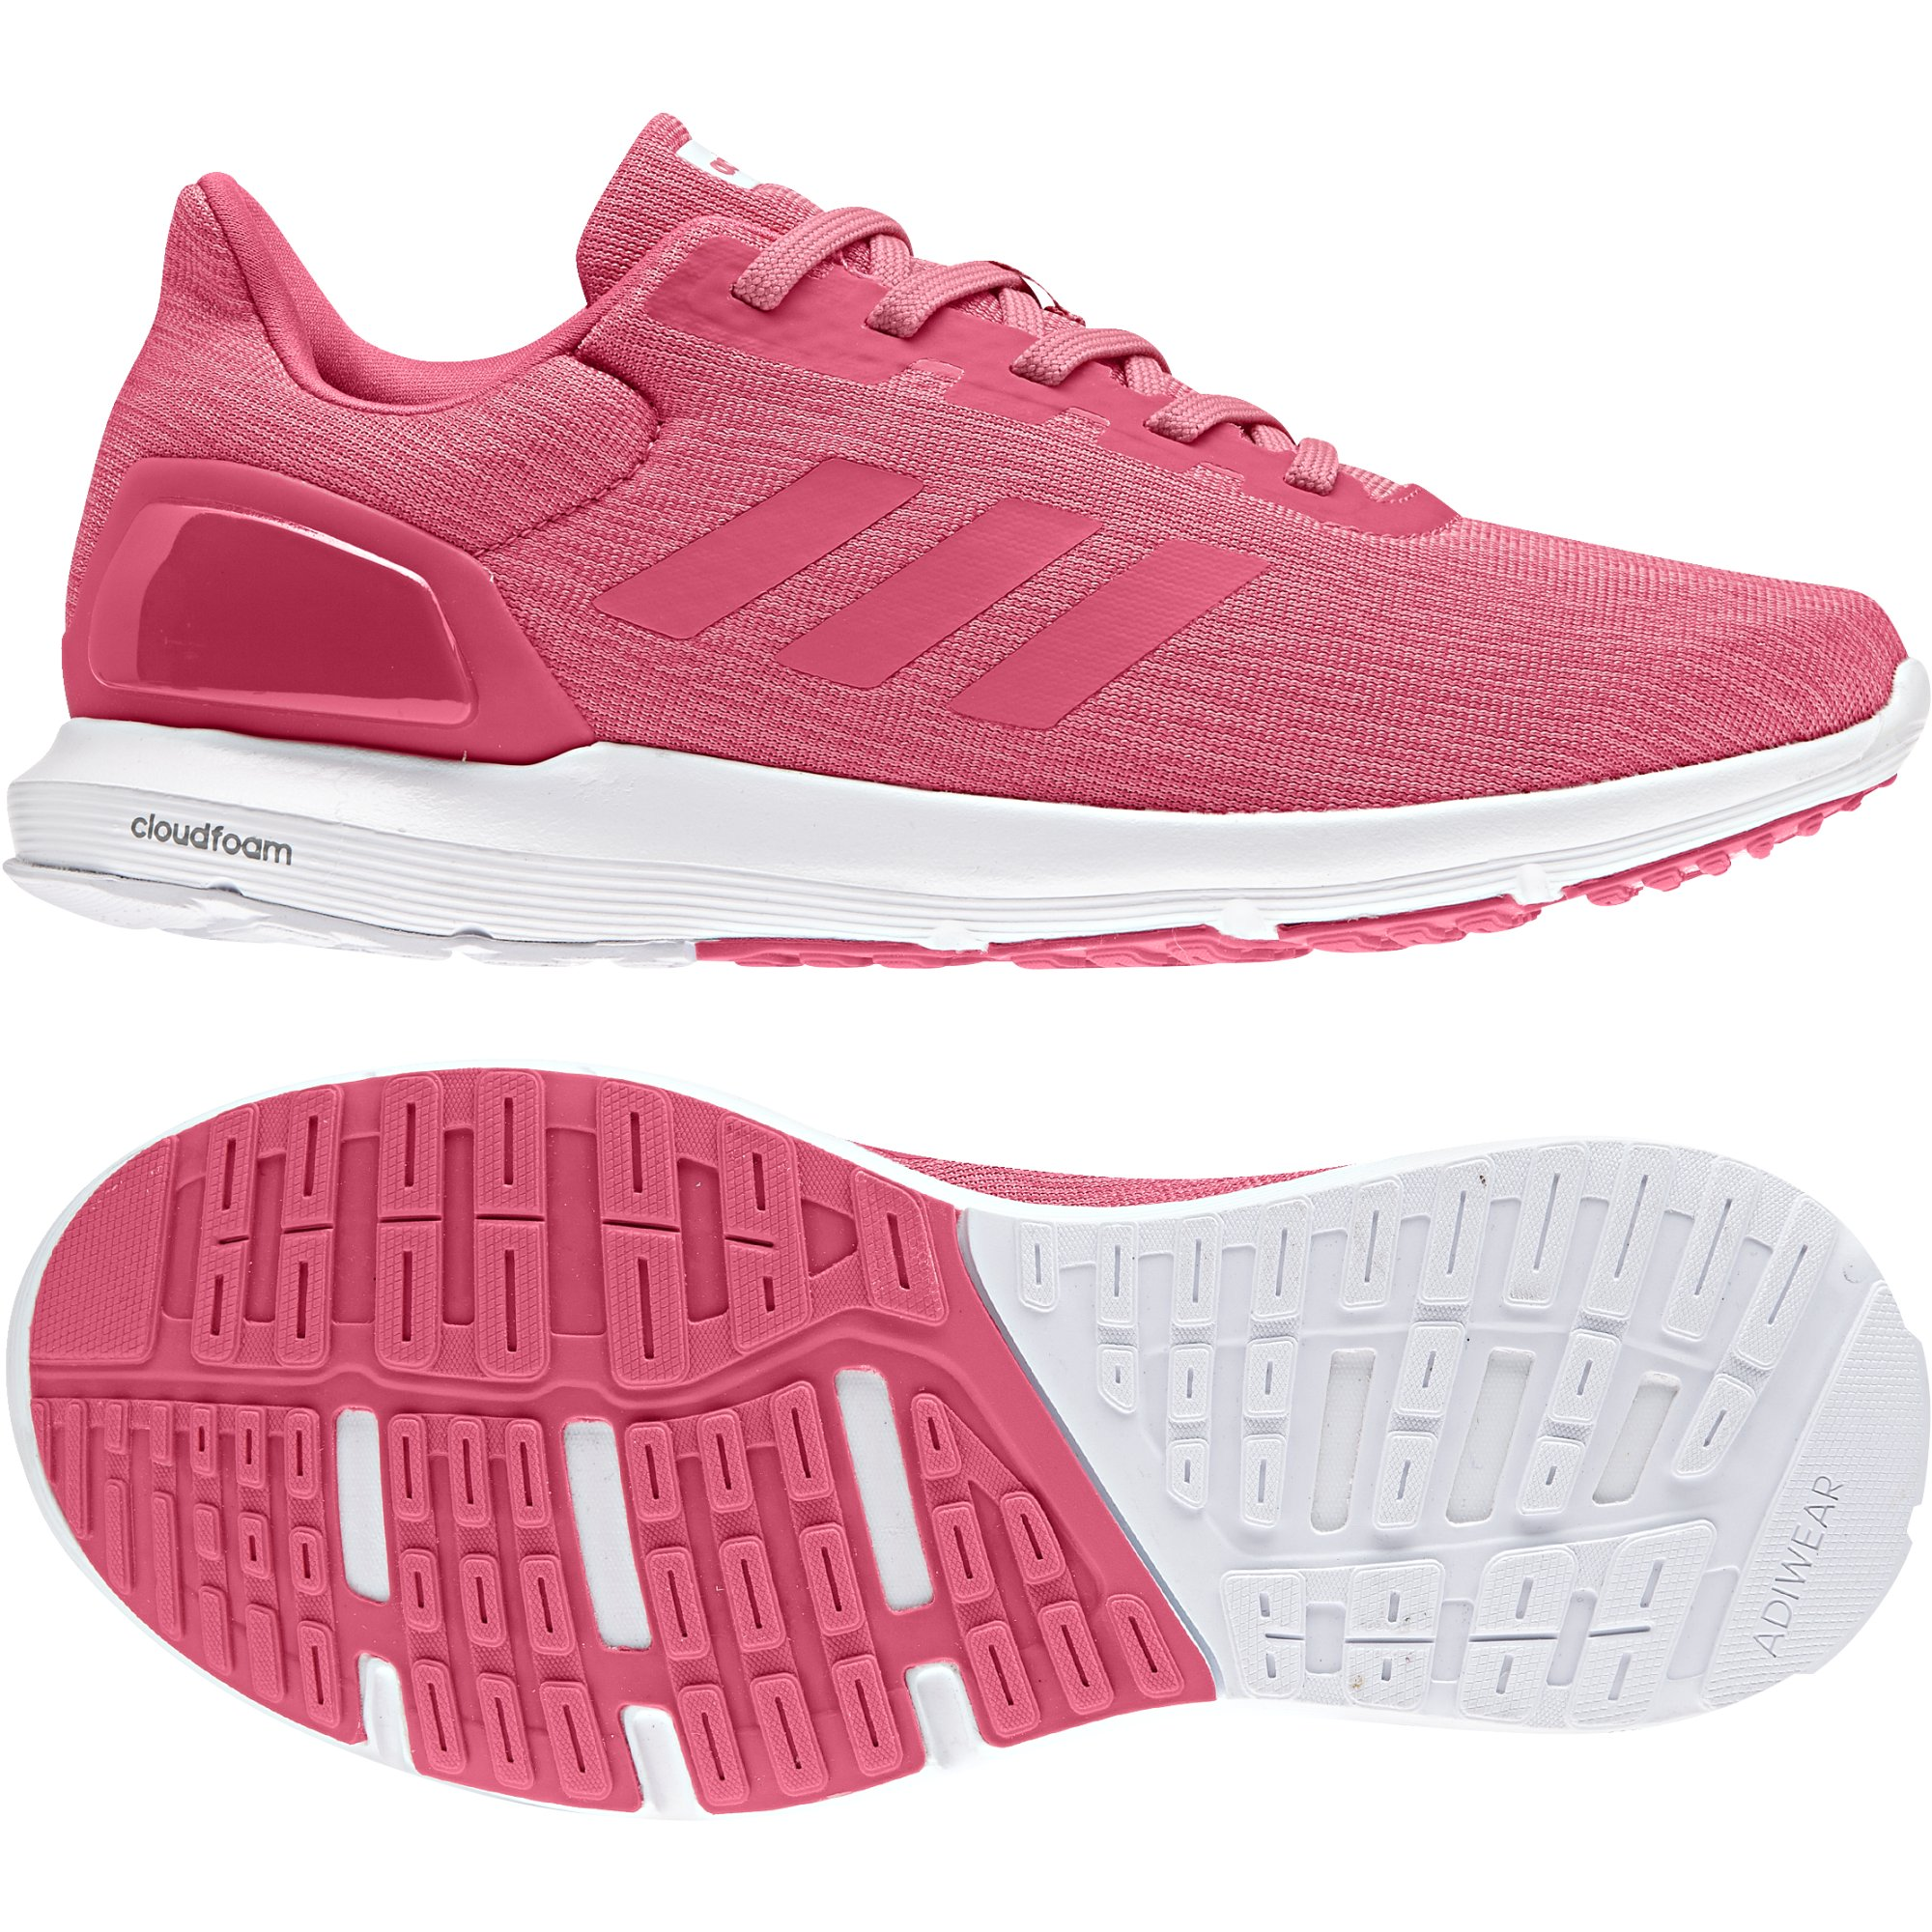 Buty Adidas COSMIC 2 (CP8717) roz.40 7141018435